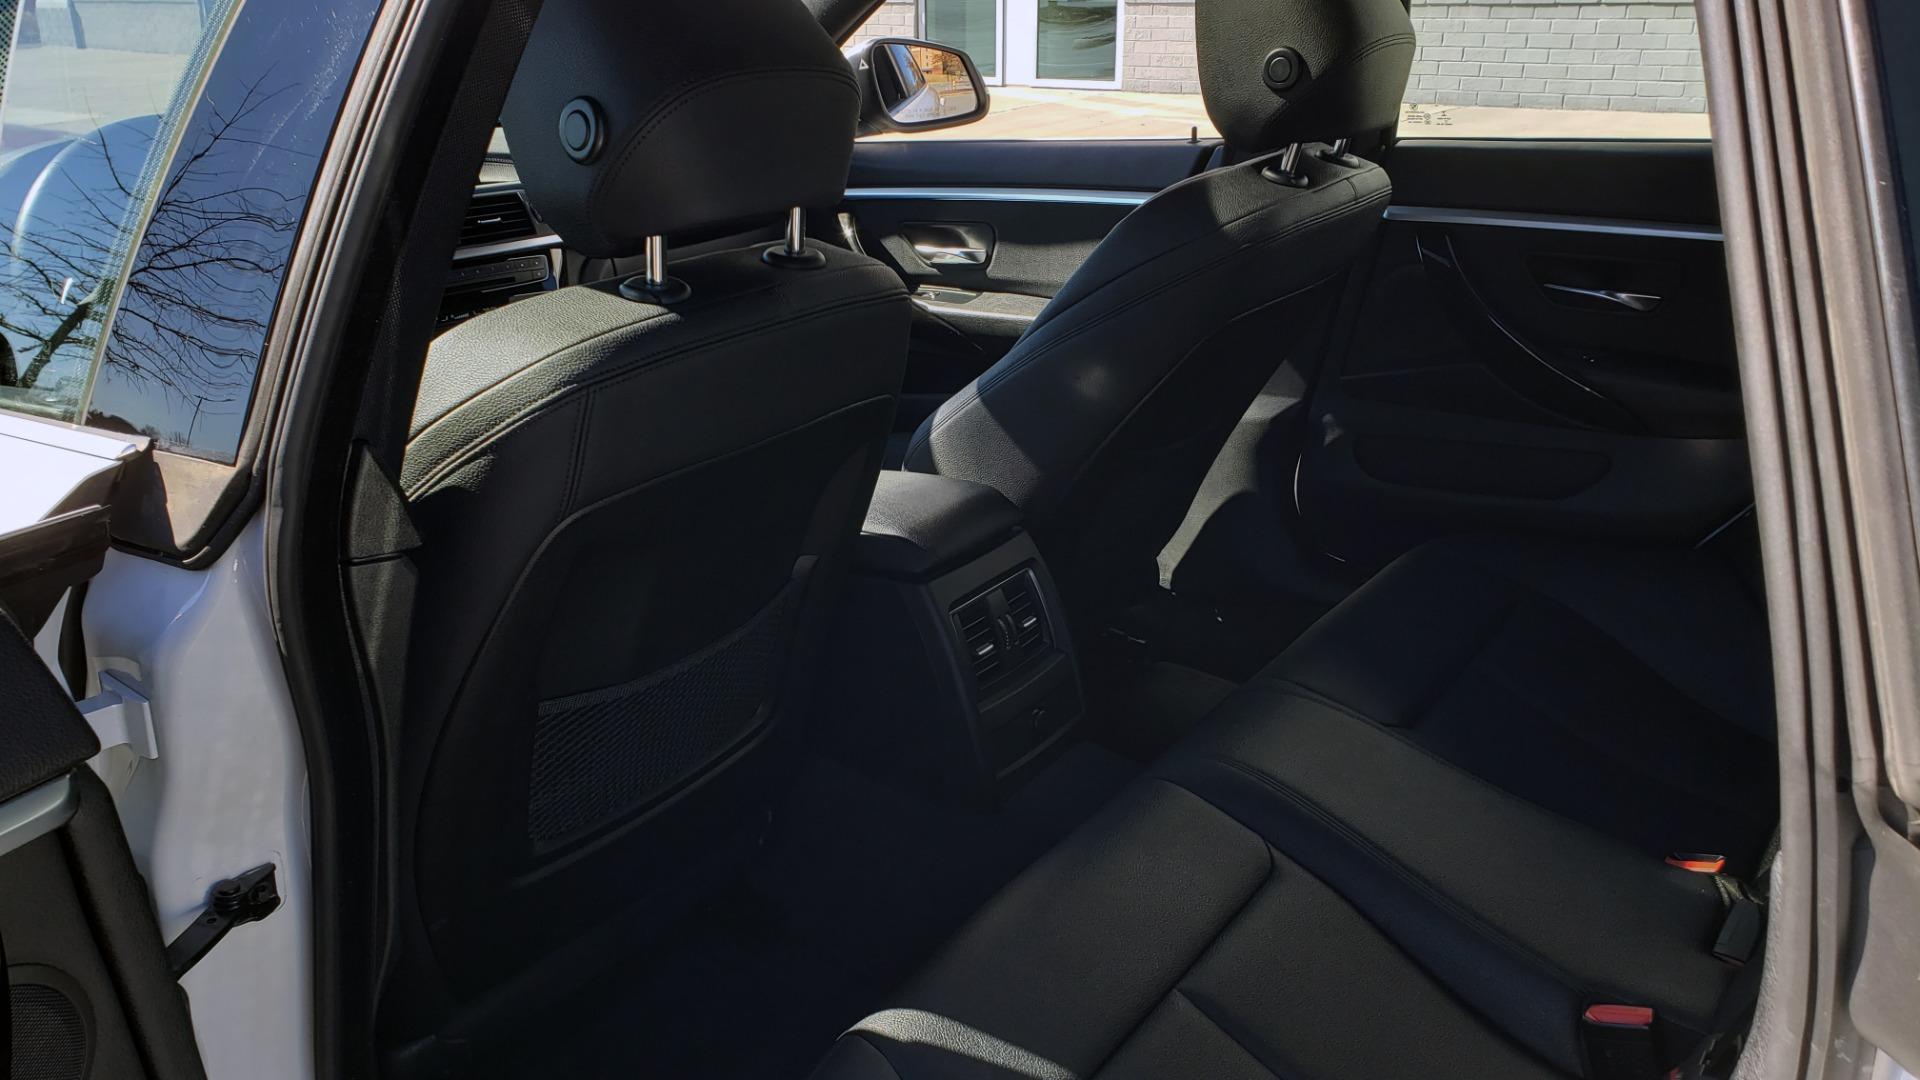 Used 2018 BMW 4 SERIES 430IXDRIVE / PREMIUM / NAV / SUNROOF / ESSENTIALS PKG for sale $27,795 at Formula Imports in Charlotte NC 28227 64